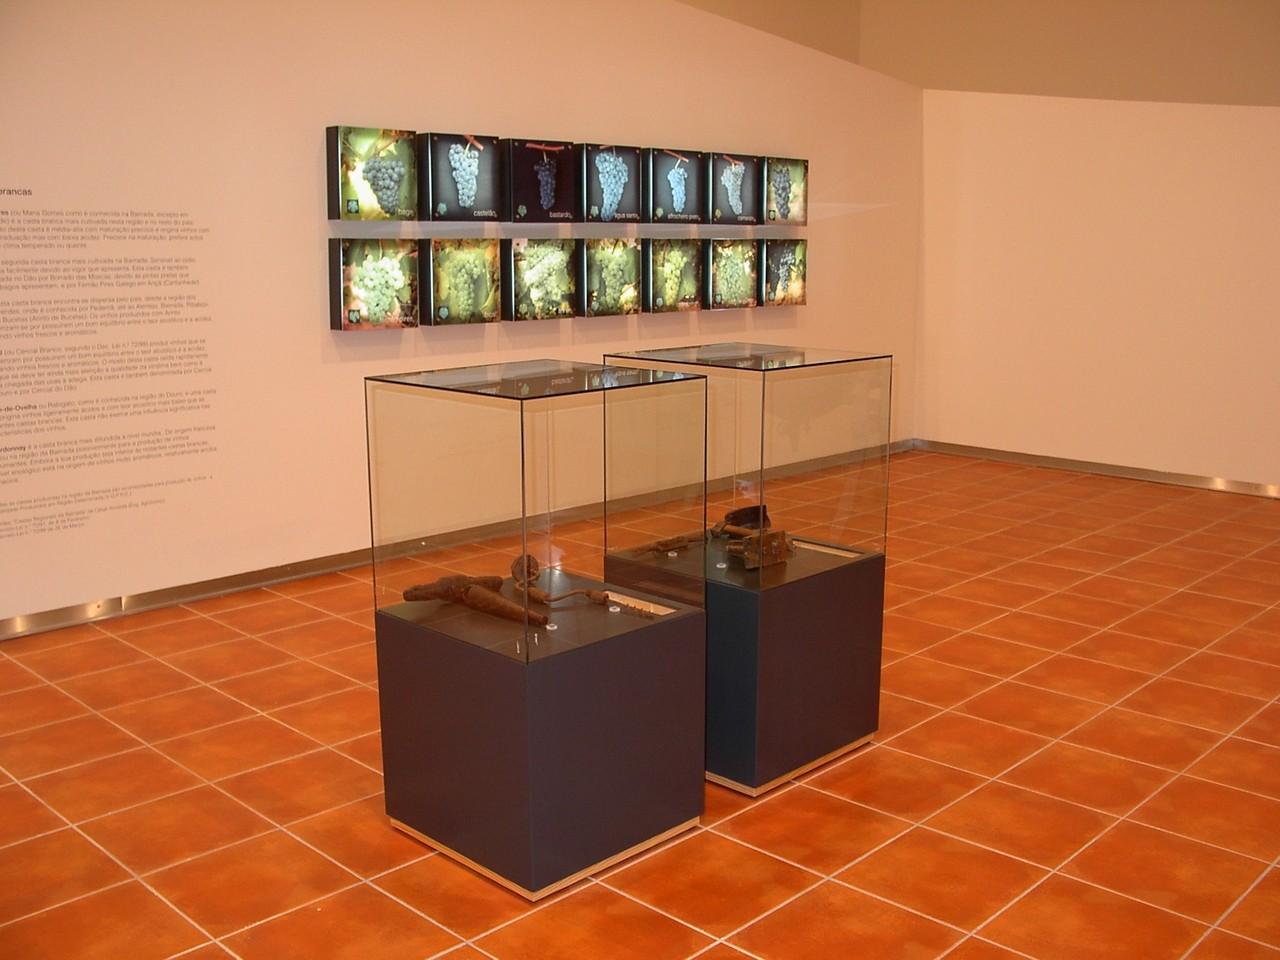 museu-vinho-bairrada-anadia.JPG